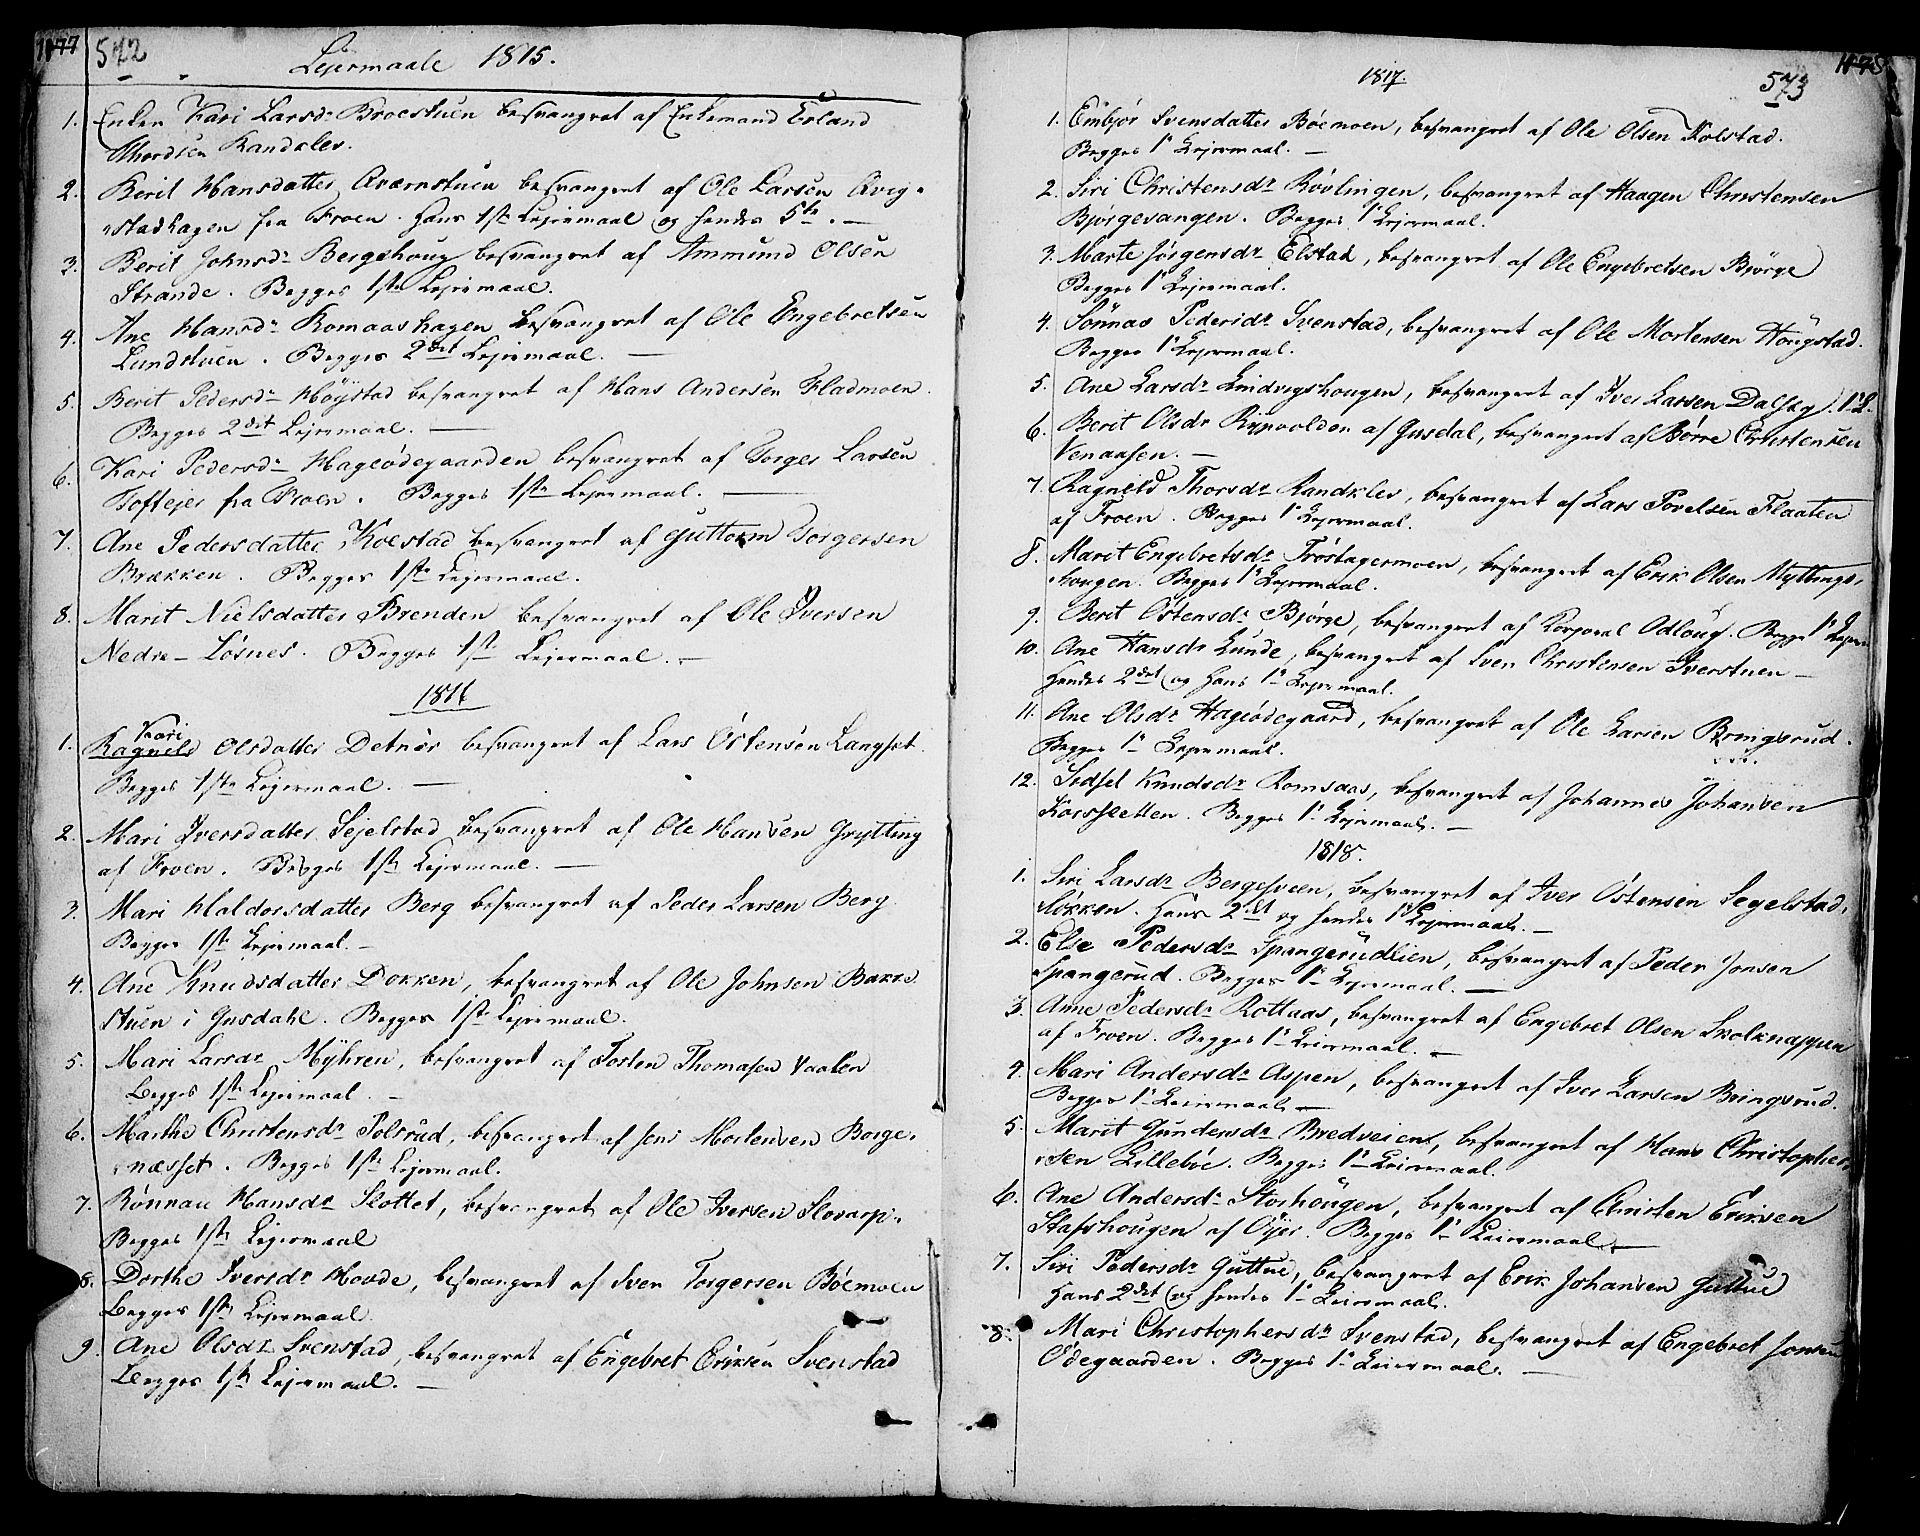 SAH, Ringebu prestekontor, Ministerialbok nr. 3, 1781-1820, s. 572-573